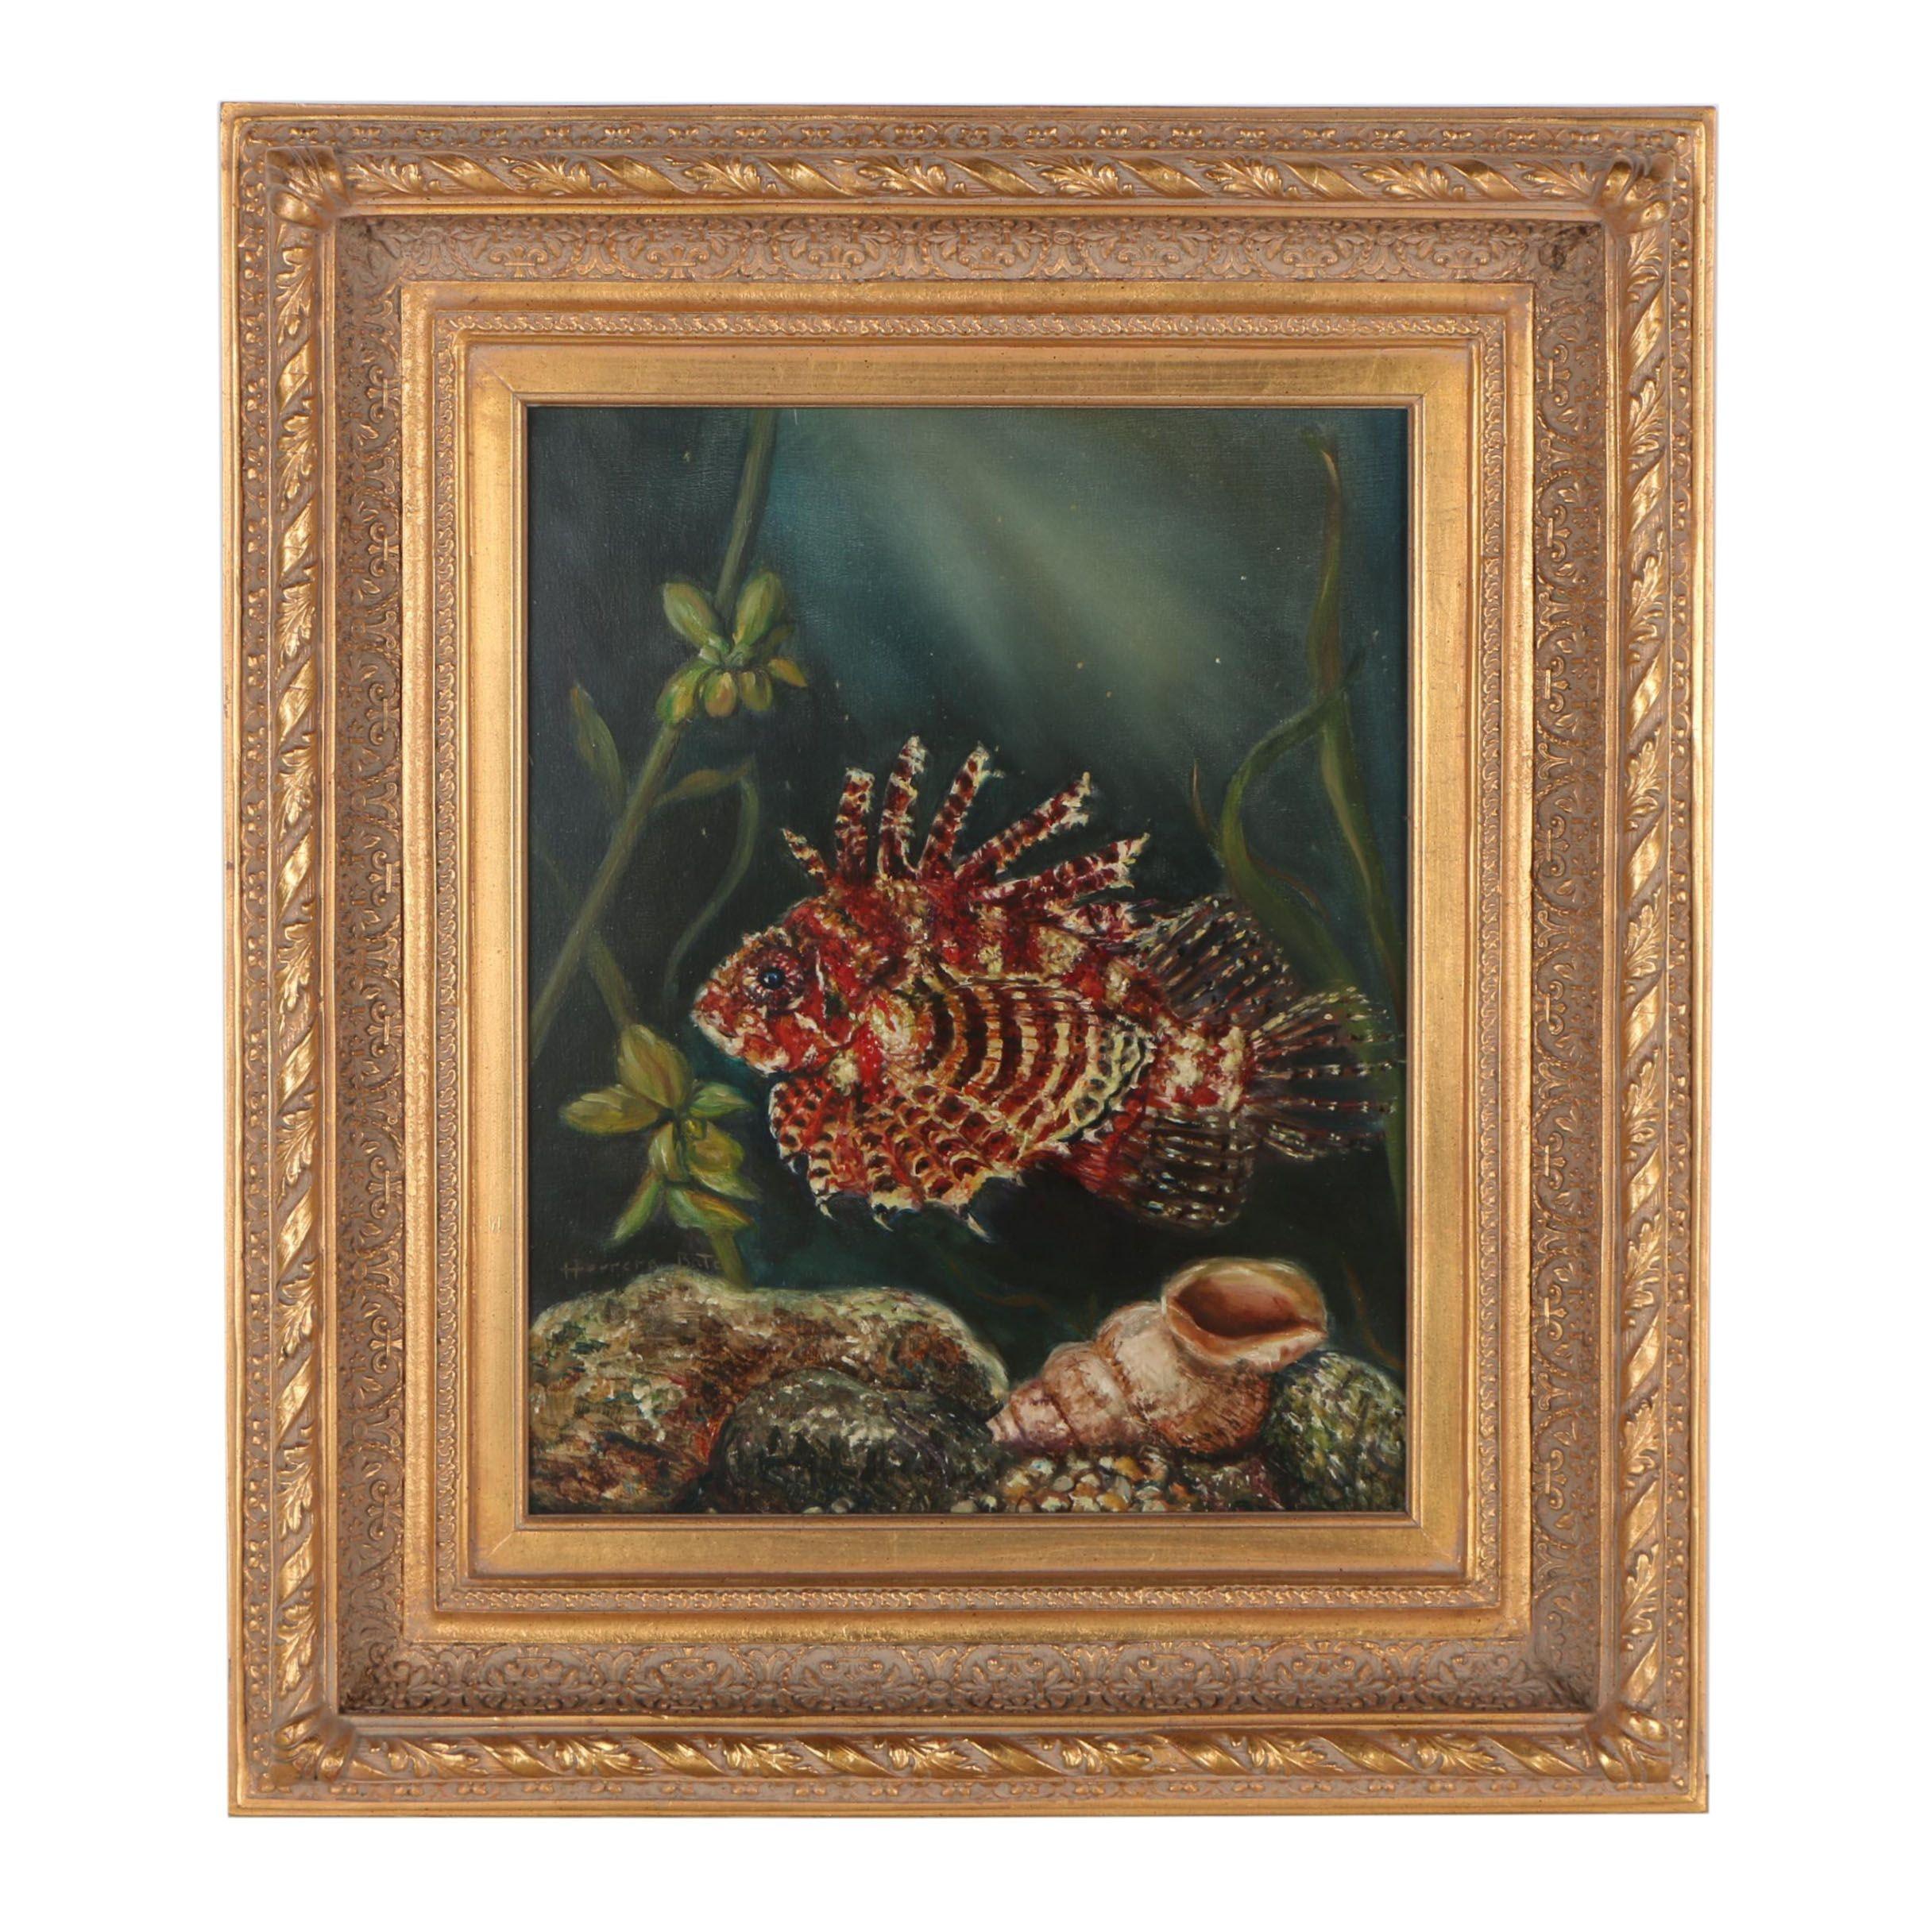 Rosa Herrera Bates Oil Painting of a Fish